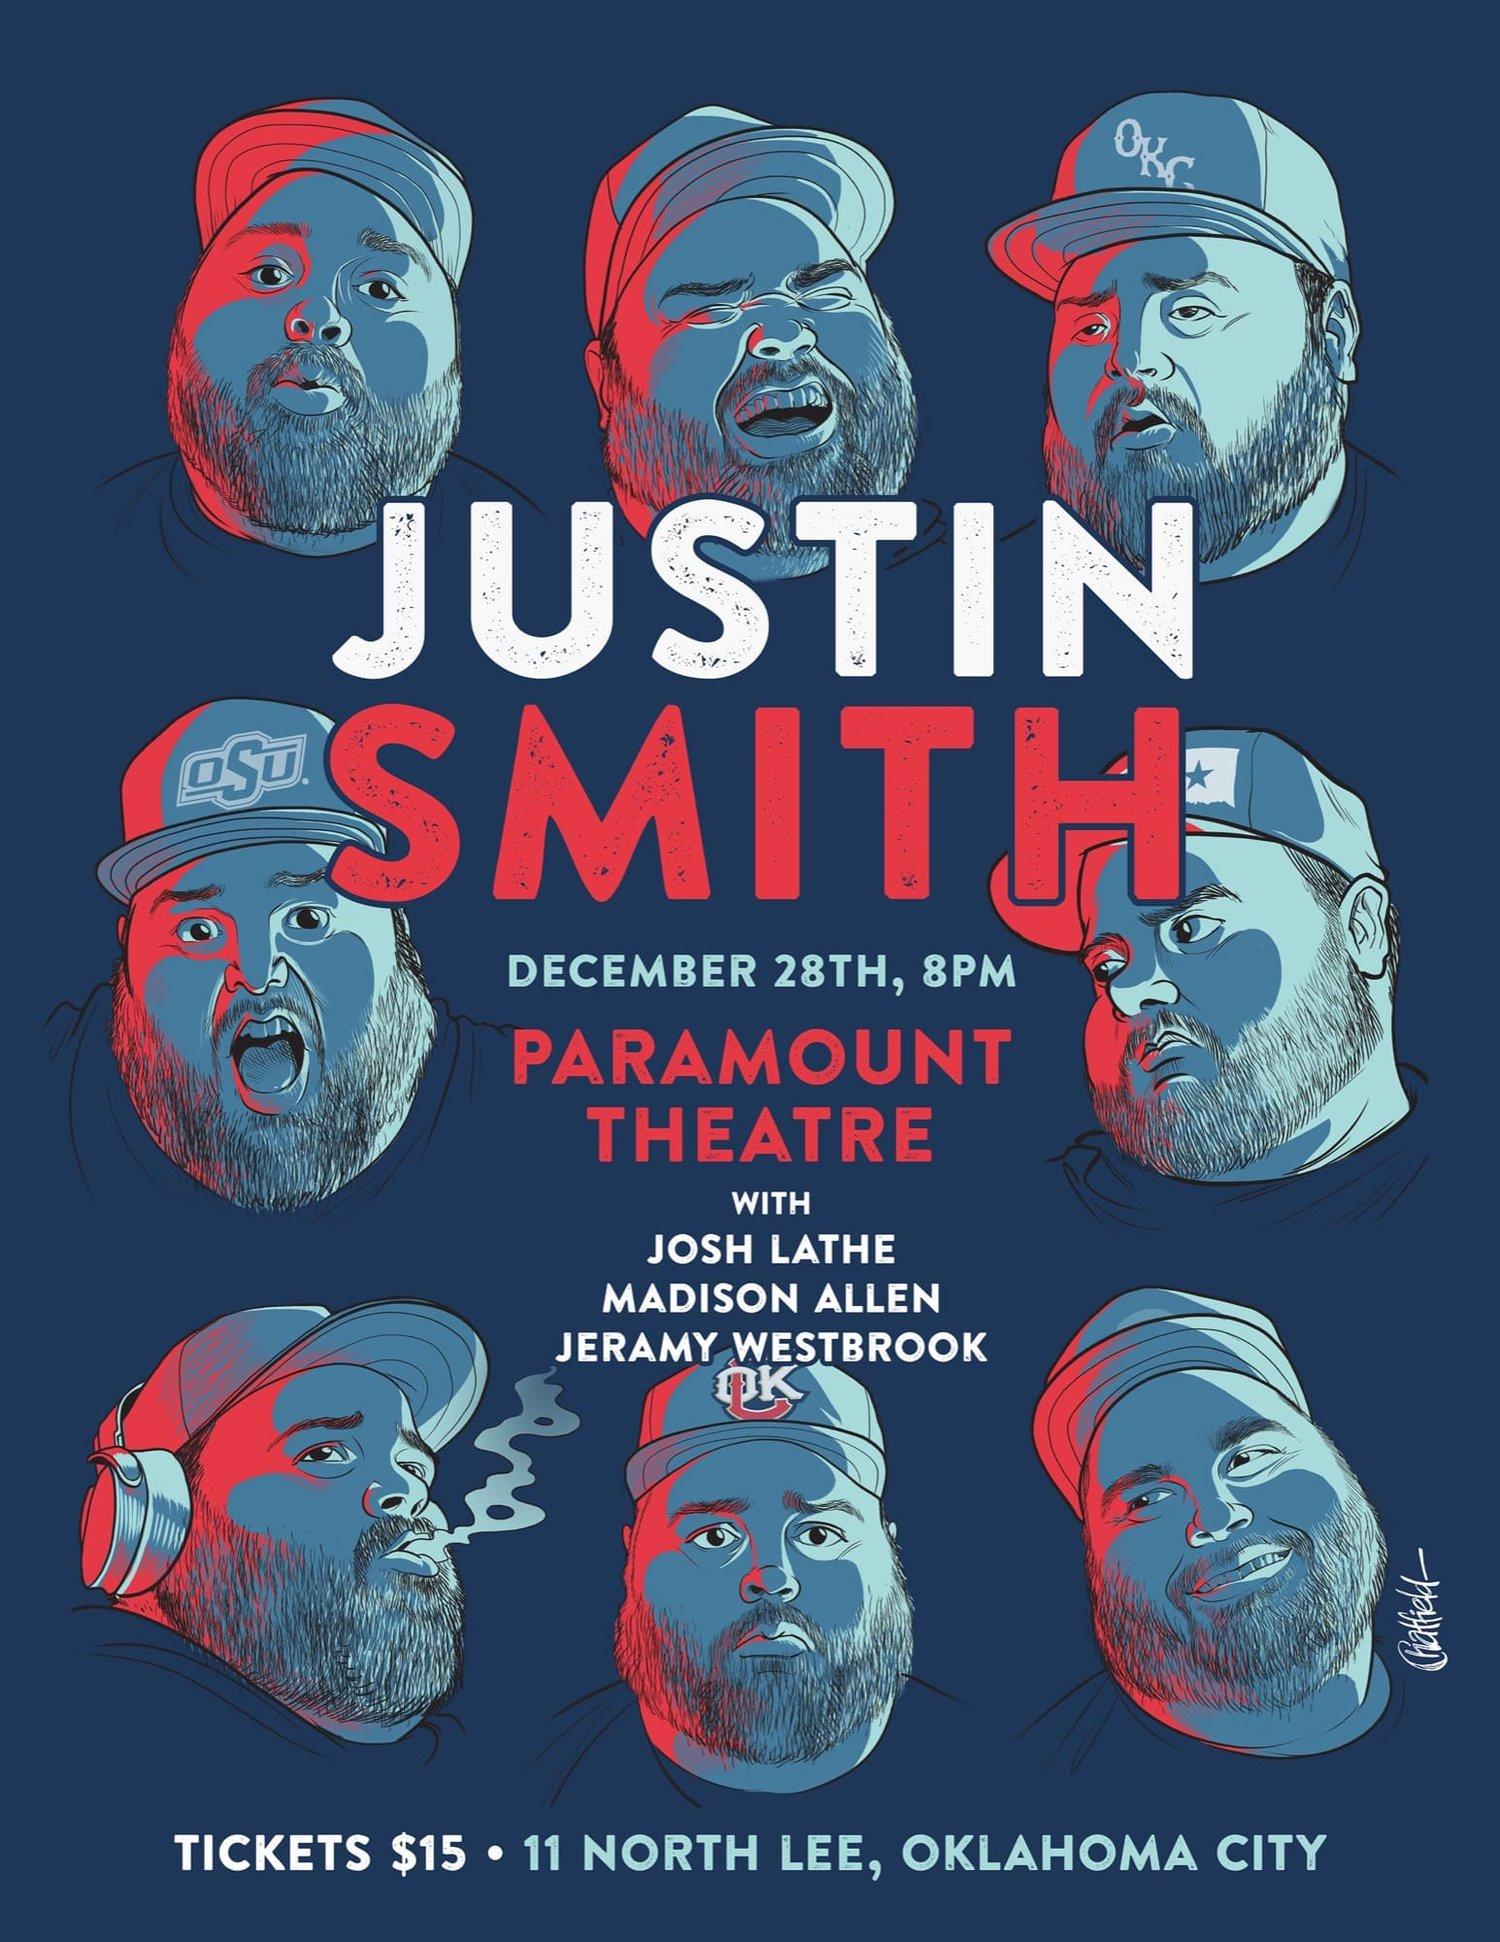 20171116_Justin+Smith+sml-min.jpg